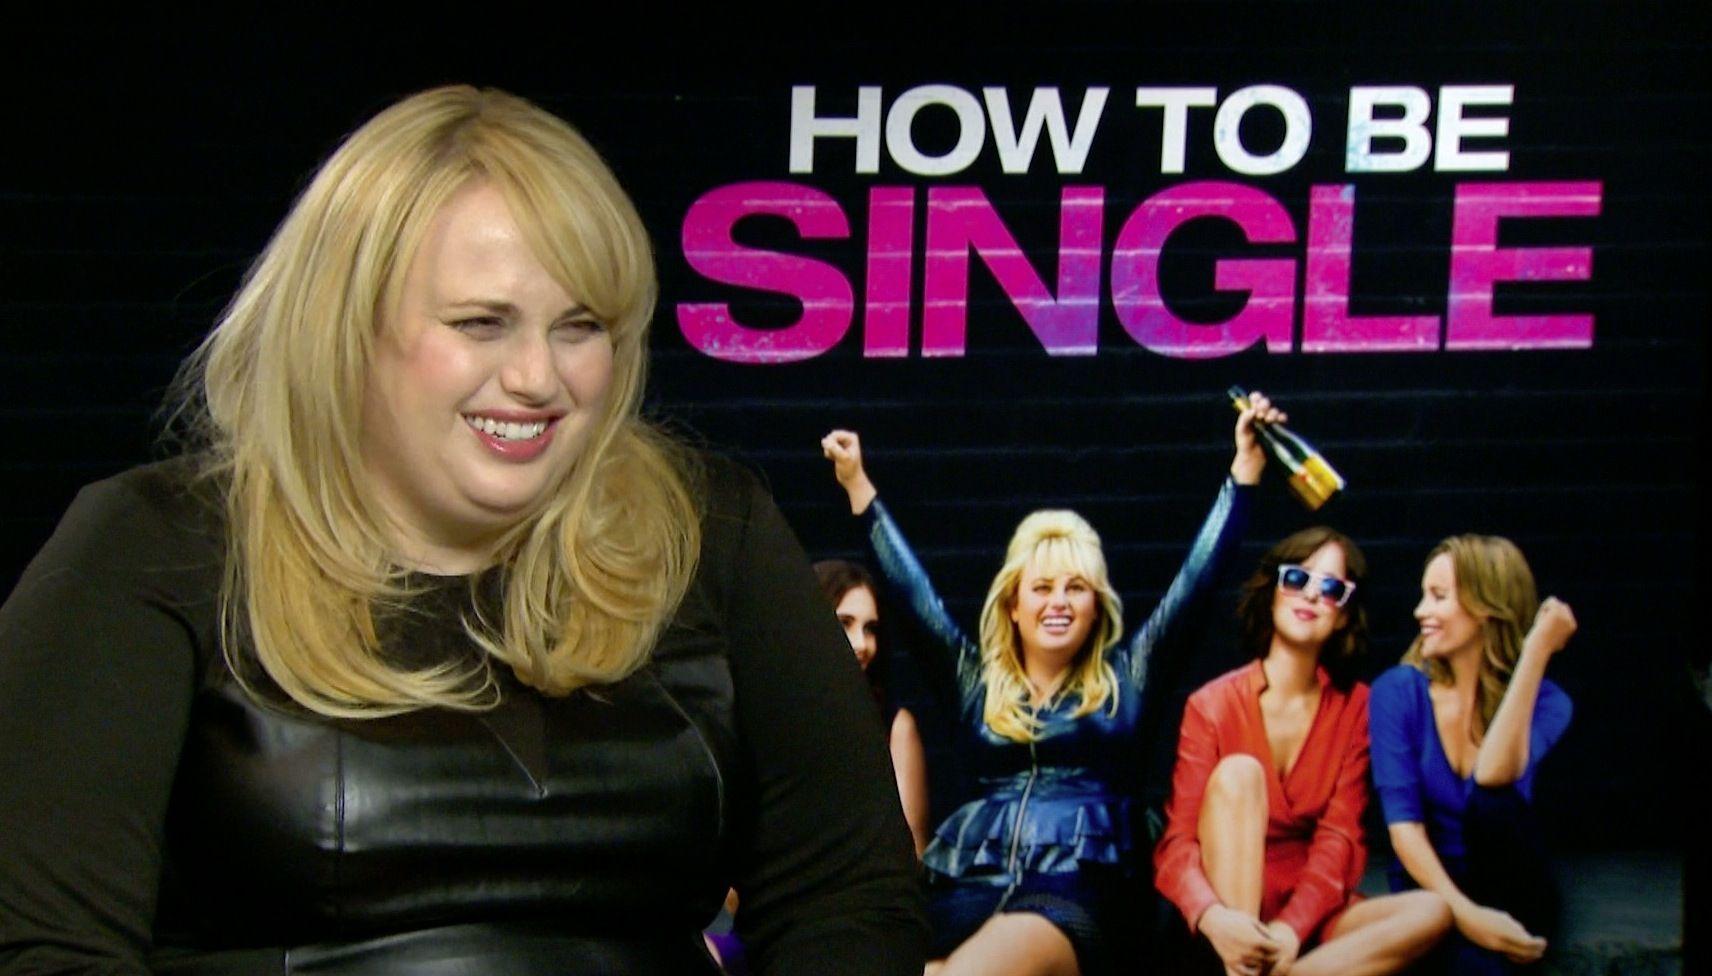 How To Be Single Trailer 1 Biopremi�r 12 Februari Youtube Rebel Wilson  Being Interviewed By Random